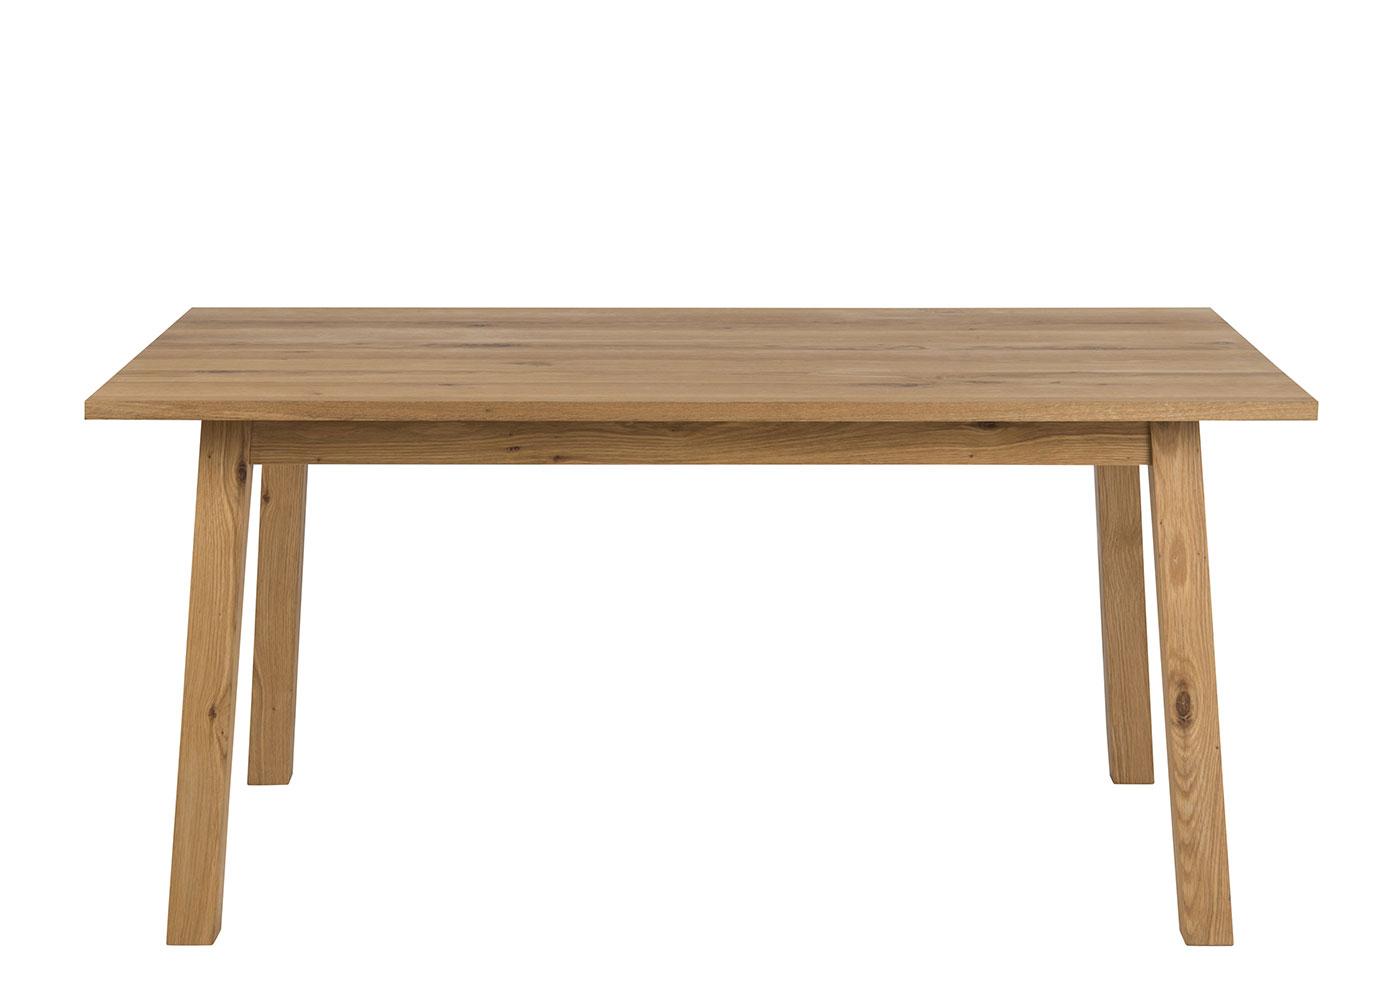 Jedálenský stôl Rachel, 160 cm, dub